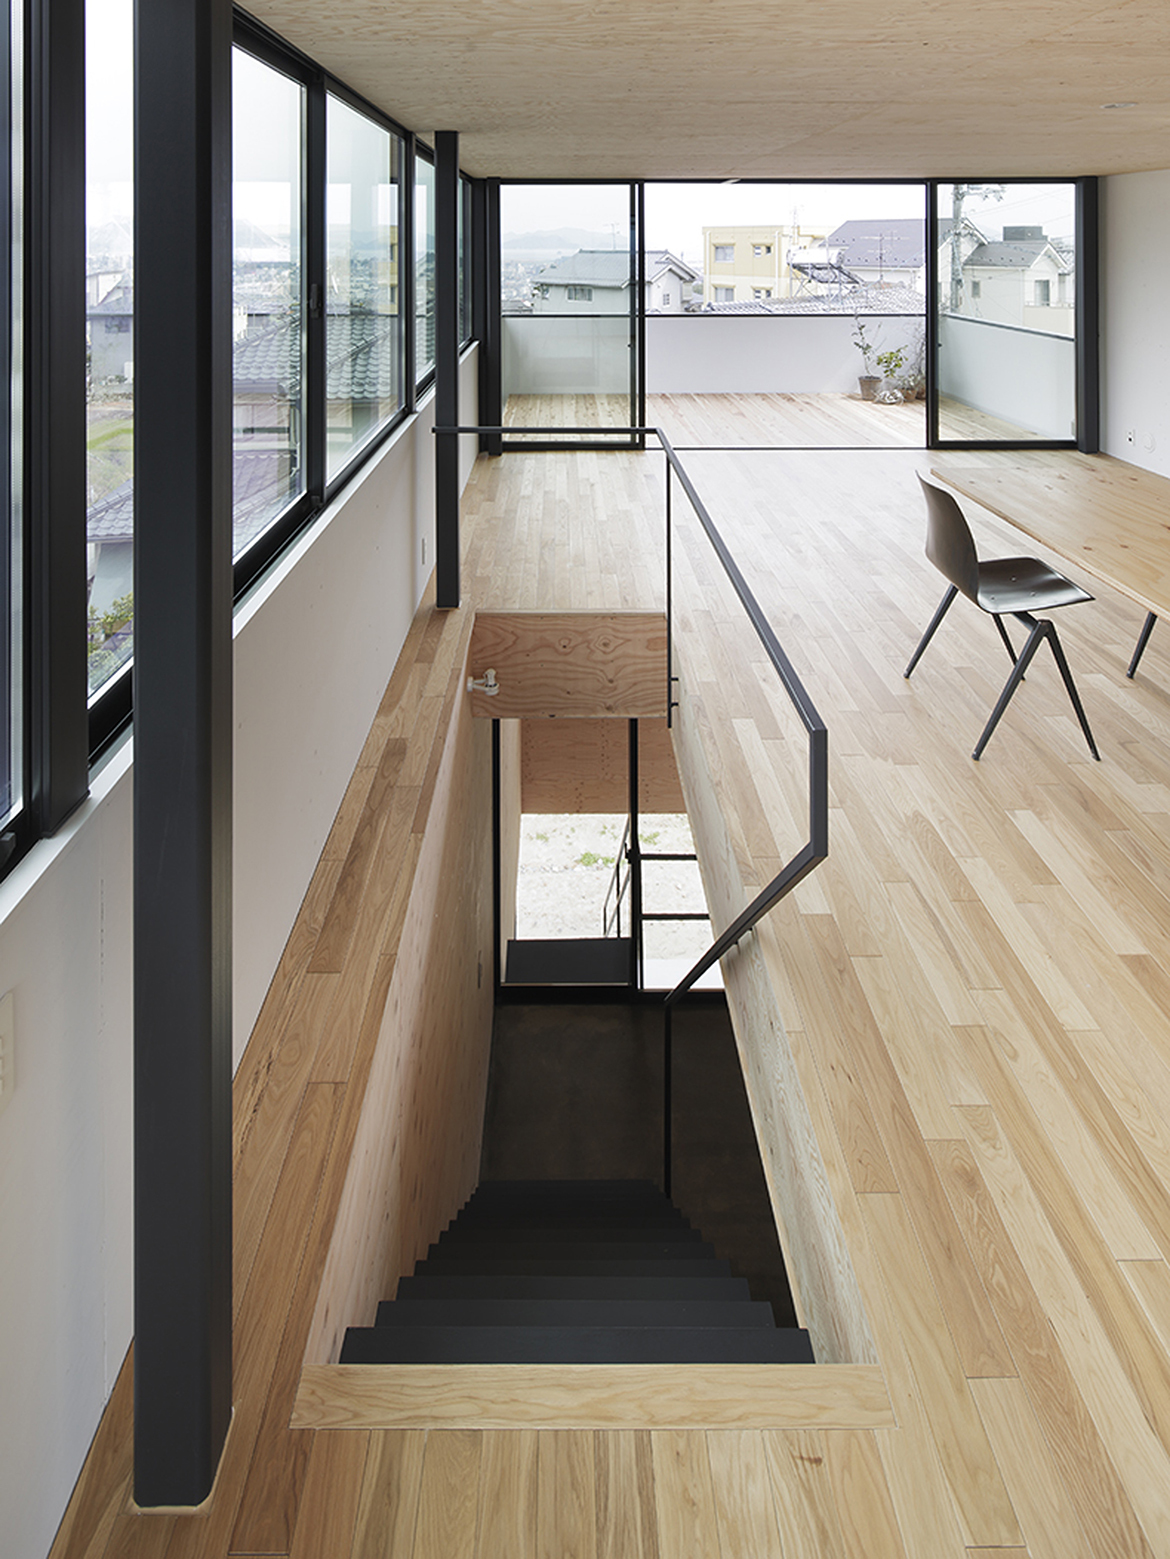 540ea1b2c07a808f0a000159_house-in-miyake-hidetaka-nakahara-architects-yoshio-ohno-architects_oono_miyake_140407_042